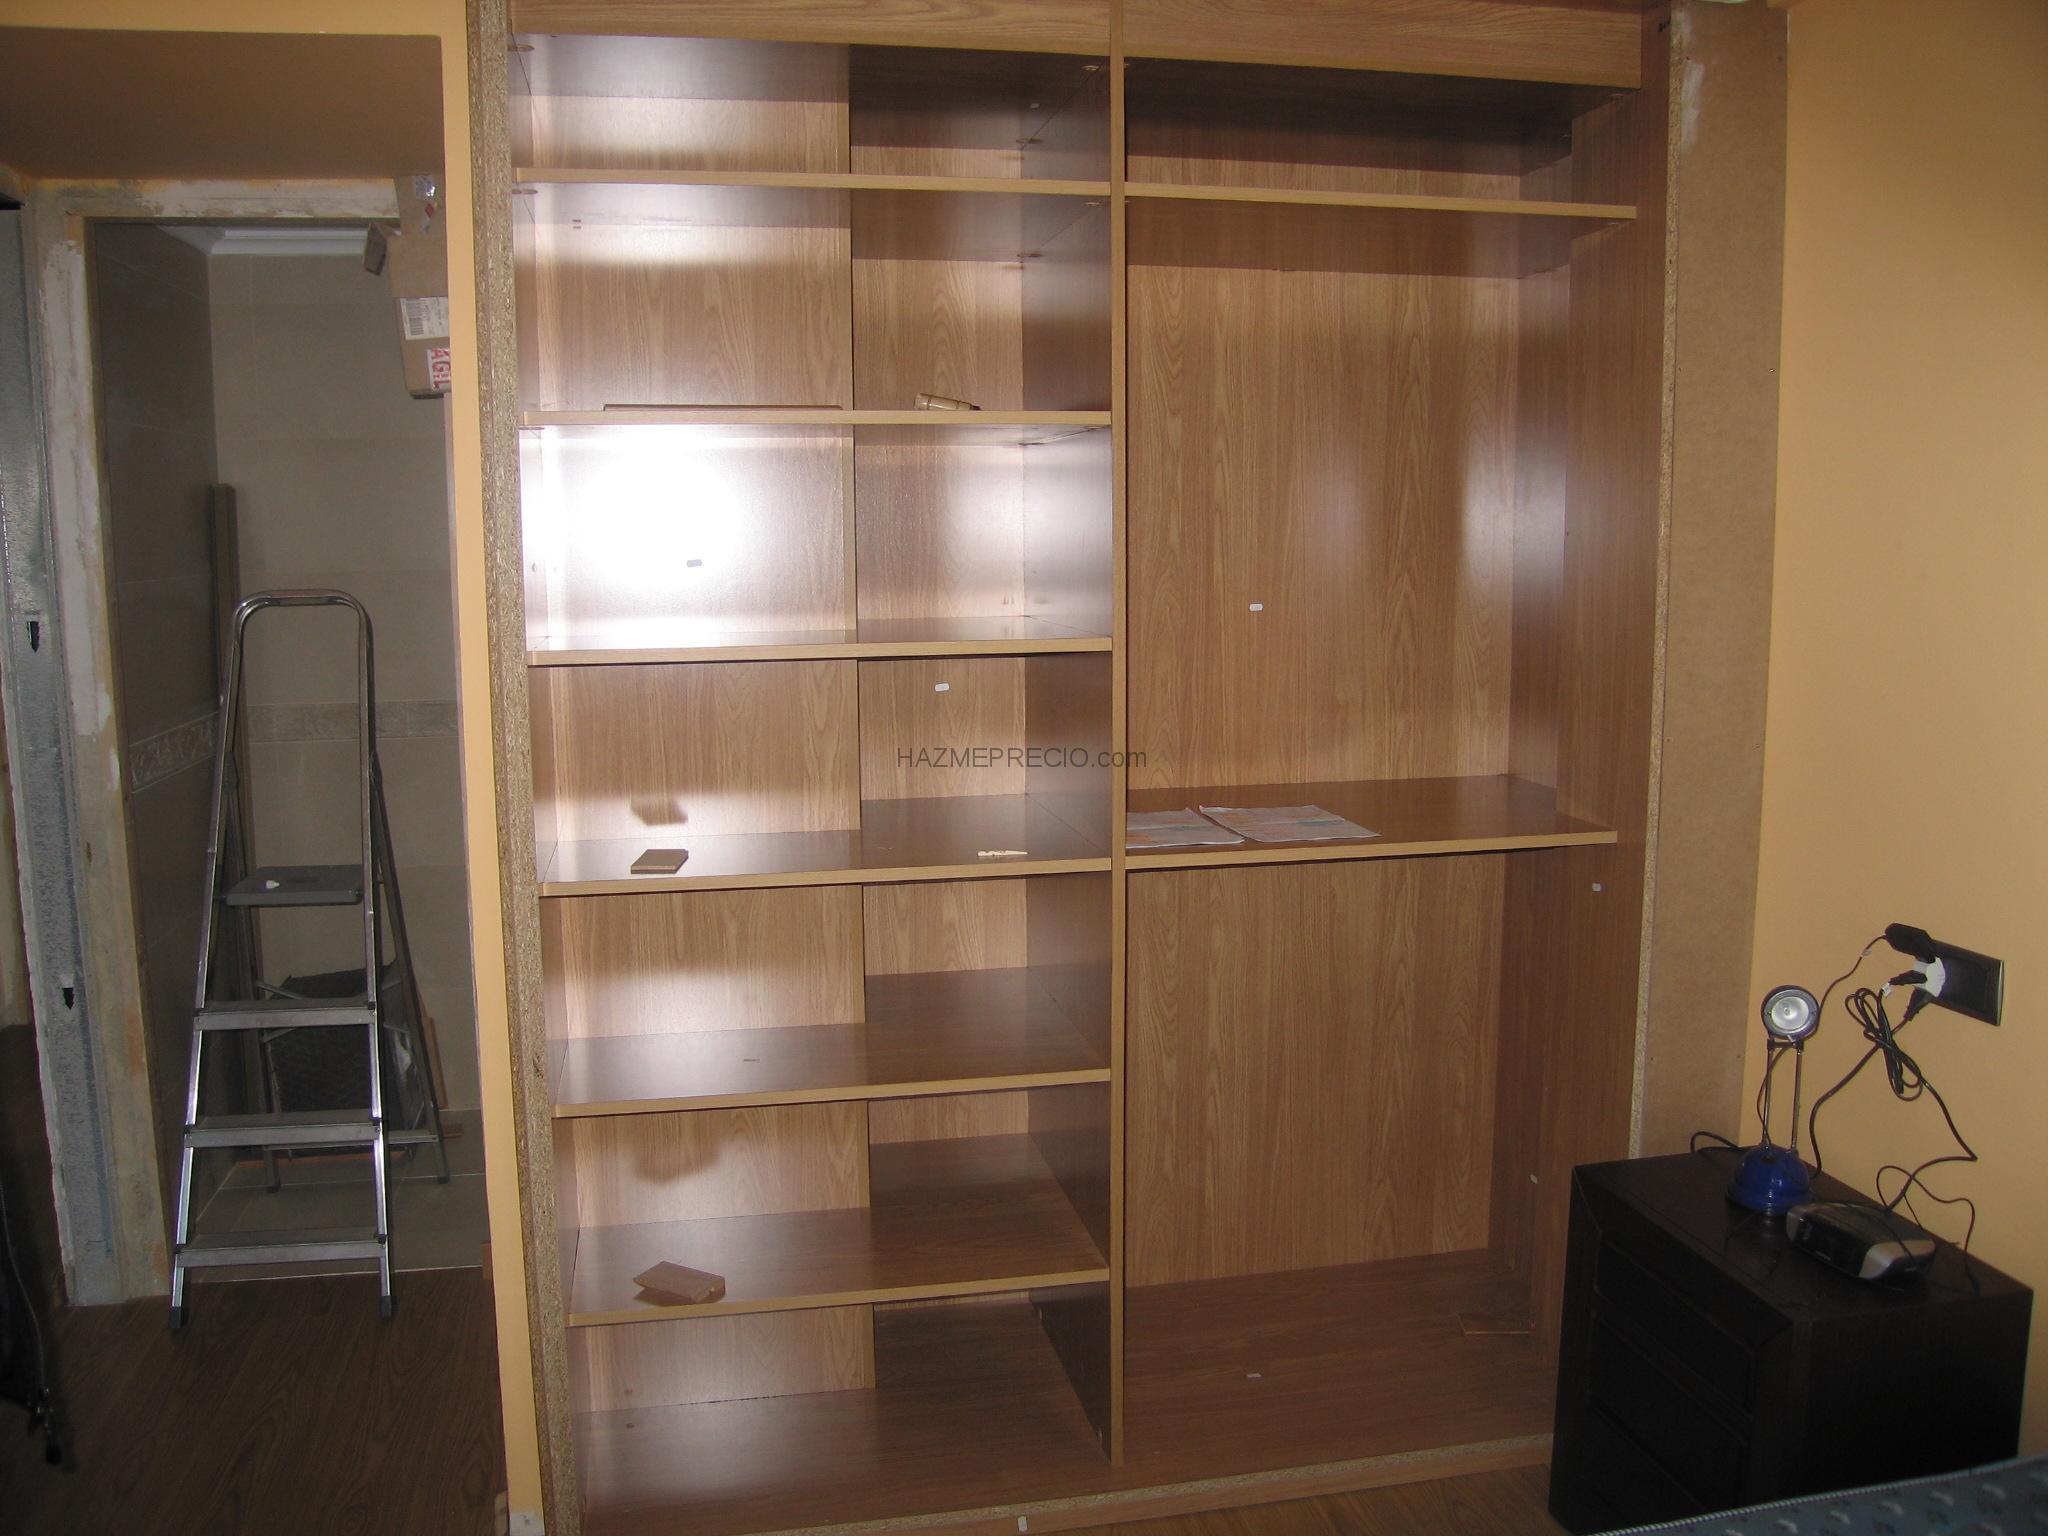 Empresas de carpinteria de madera en oviedo - Armarios empotrados oviedo ...